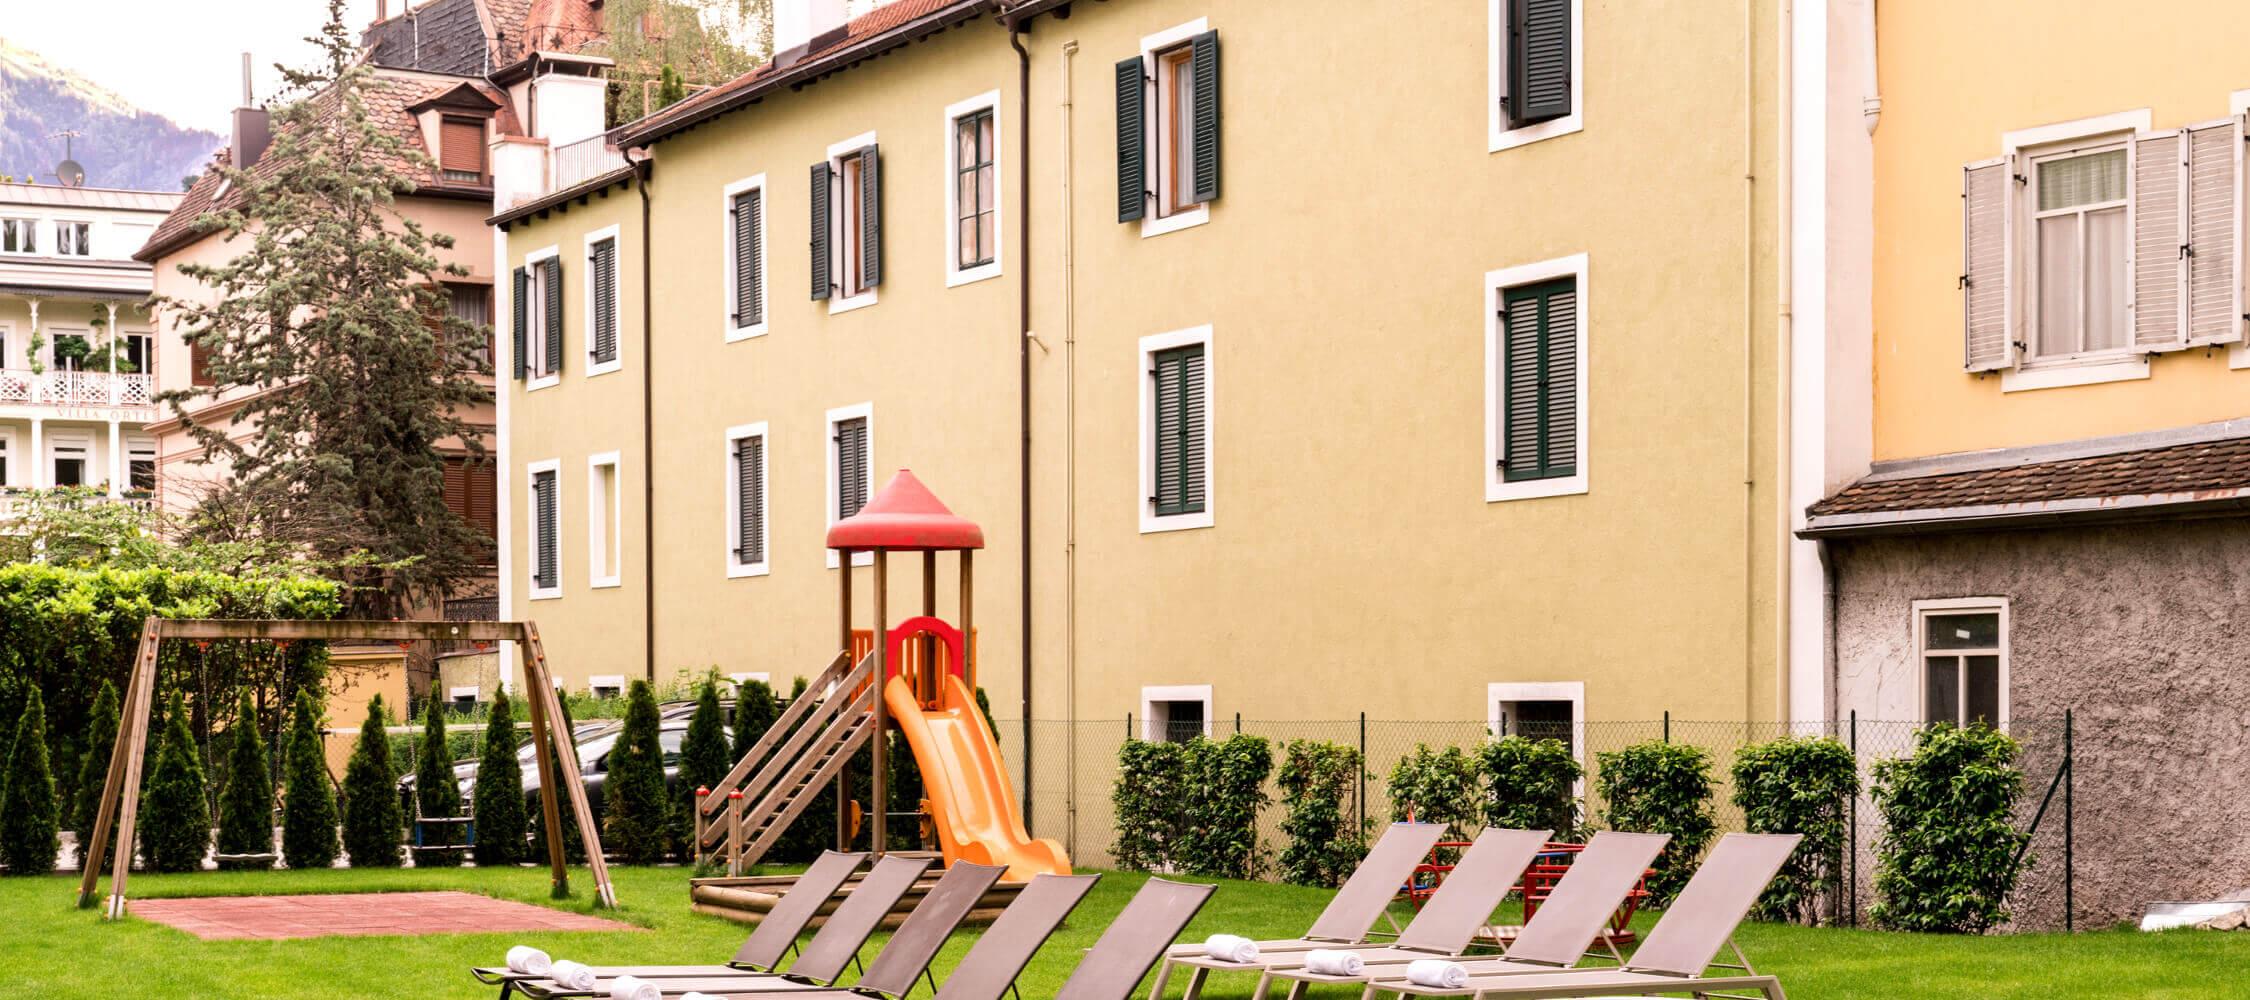 Hotel_Flora_Merano_Family_Kinder_Kinderspielplatz_Garten_BeatricePilotto_DSC03537_2250x1000